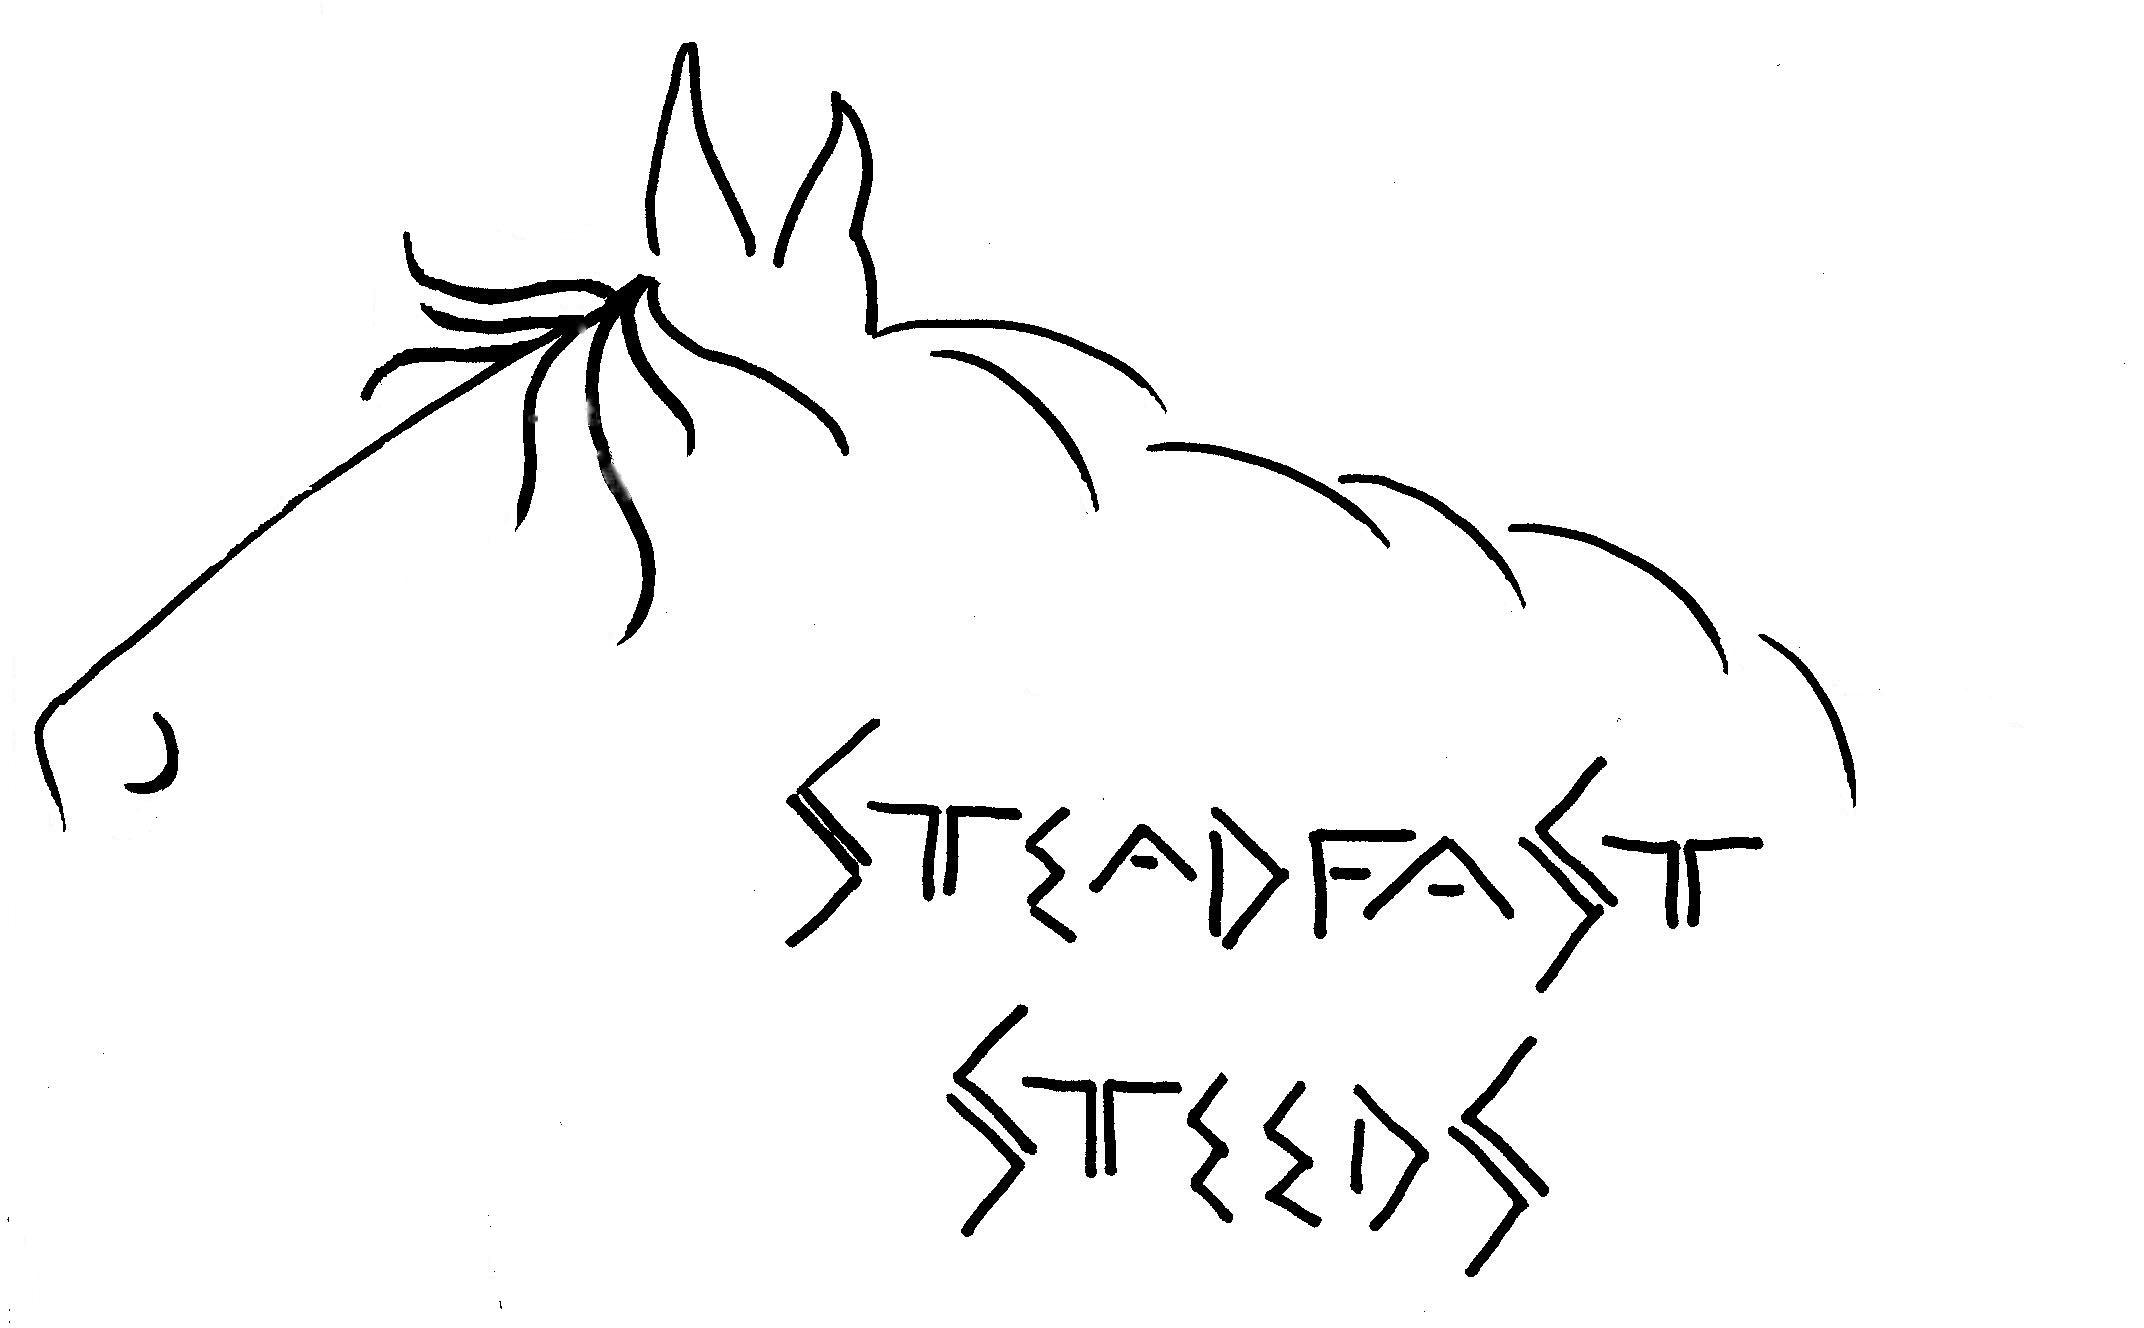 Steadfast Steeds Animal Sanctuary Logo.png